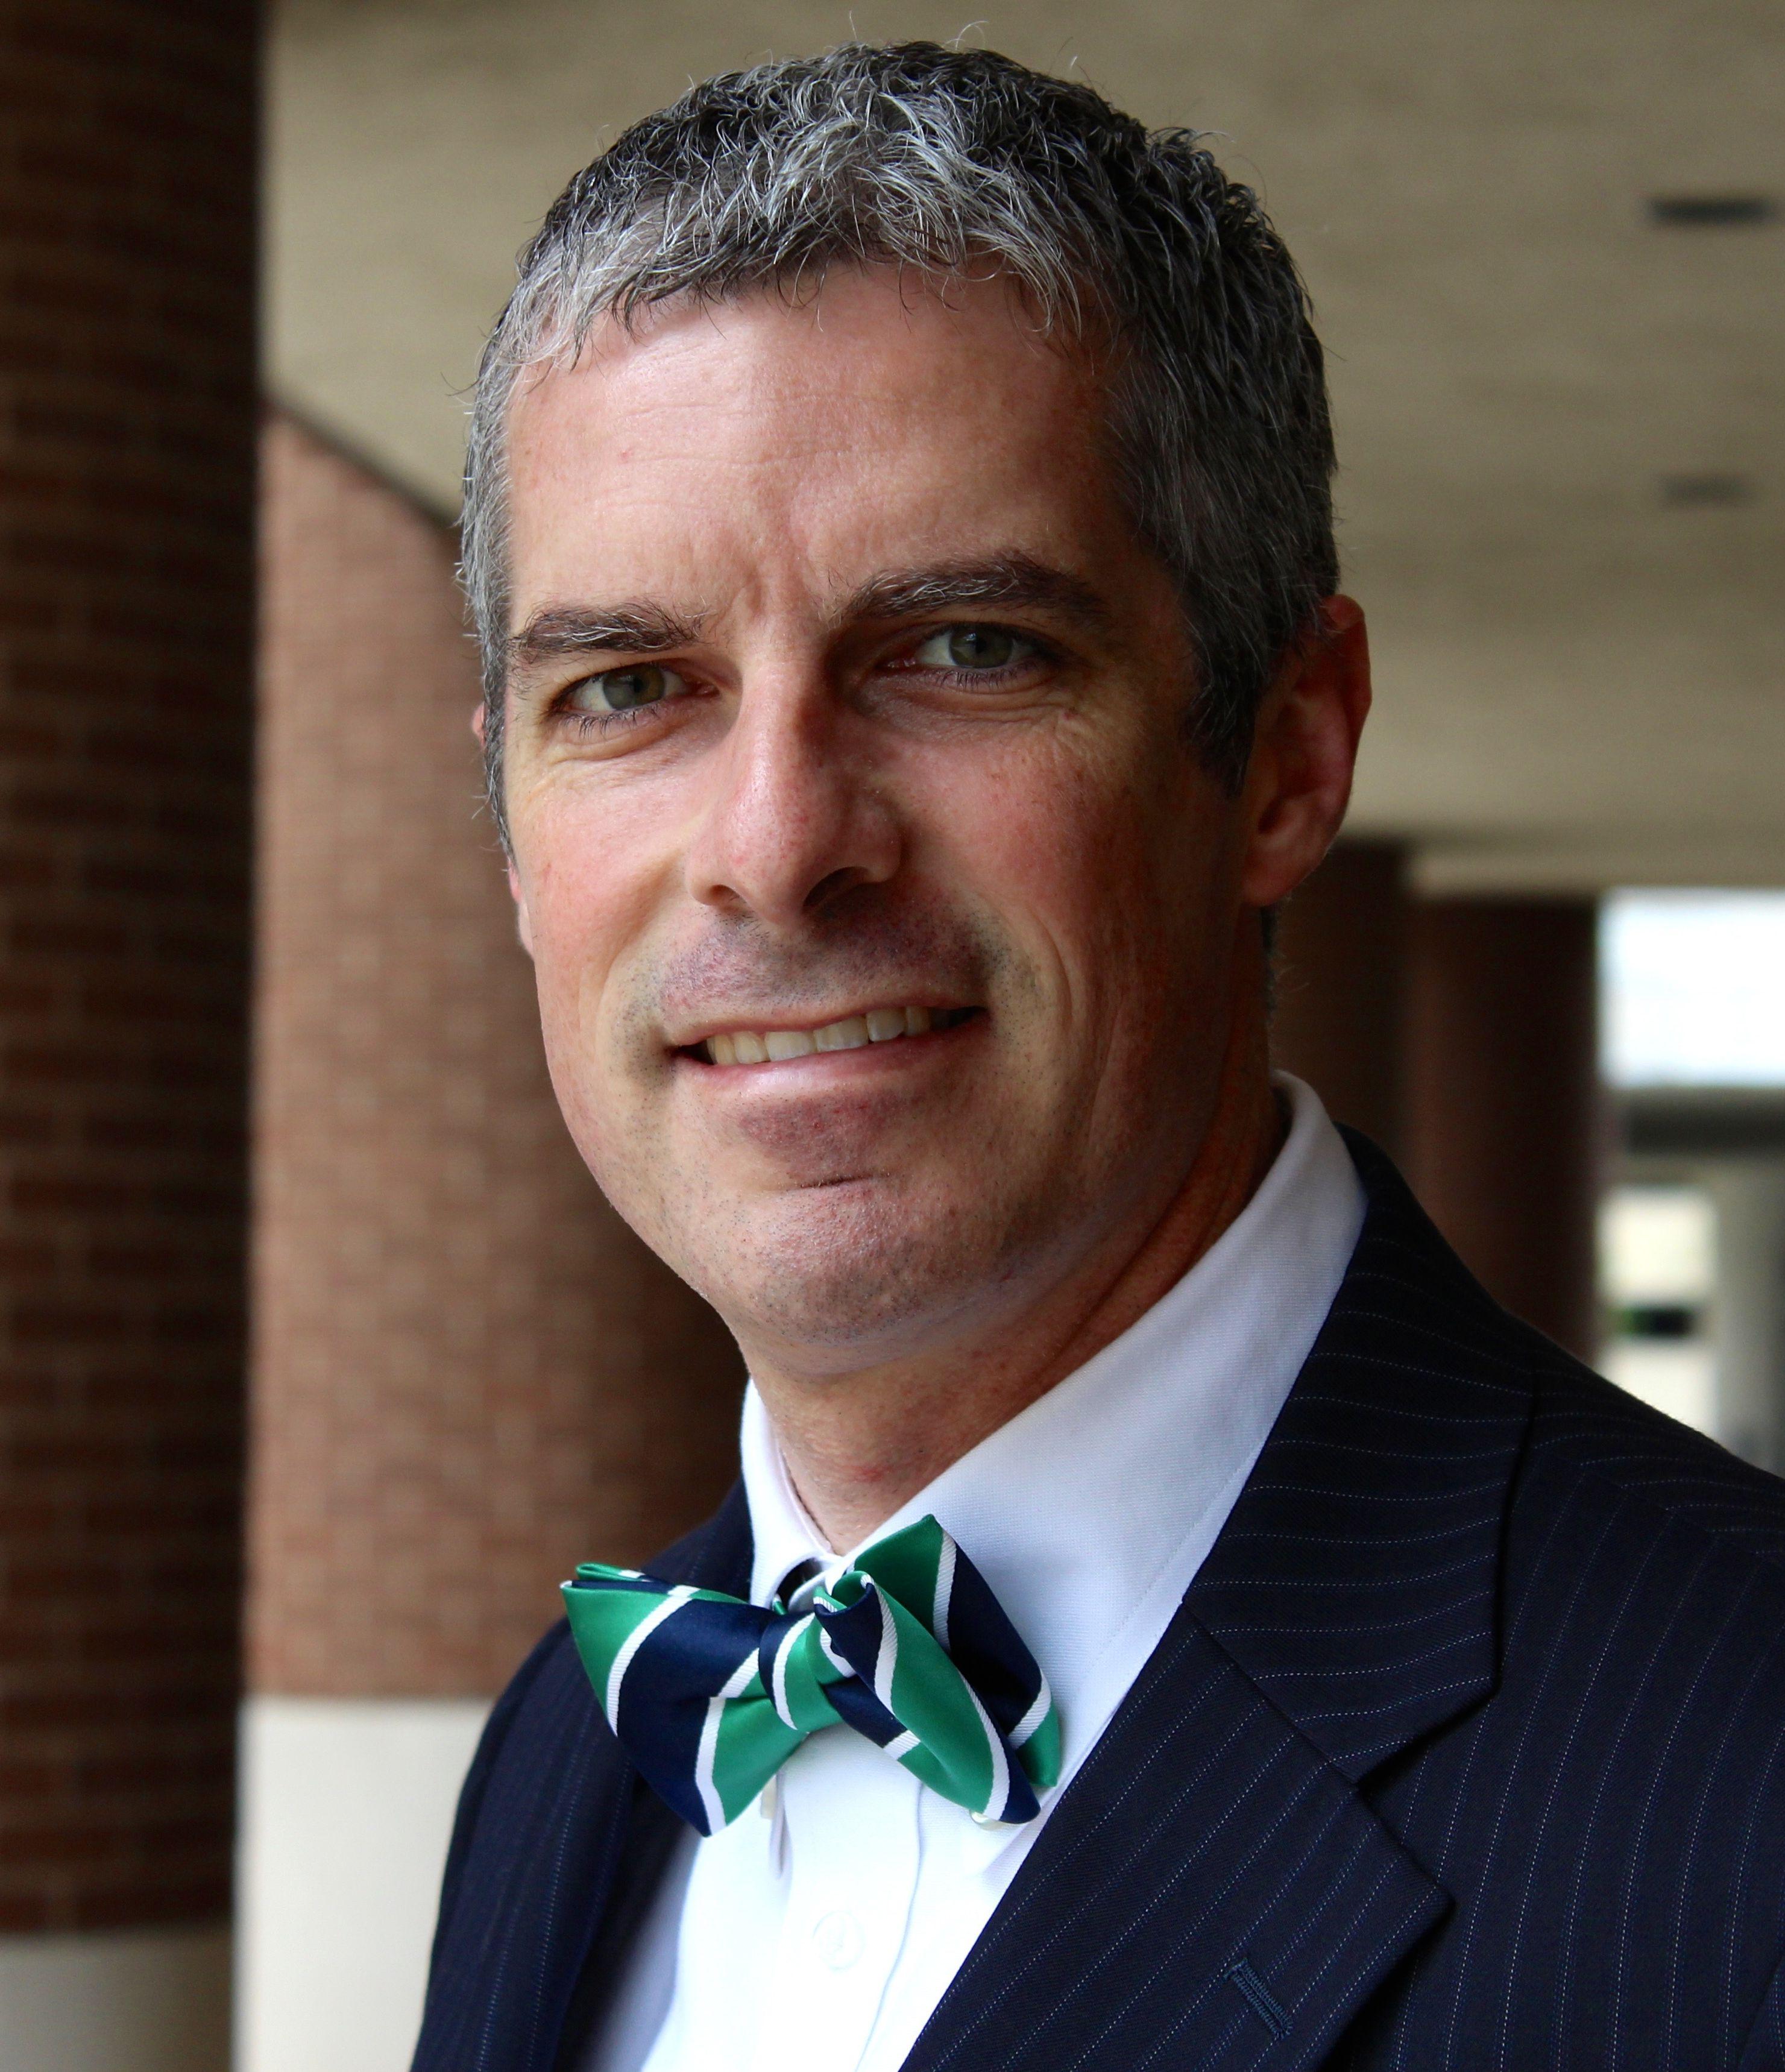 Wir begrüßen Fulbright Professor Brian Smith, PhD